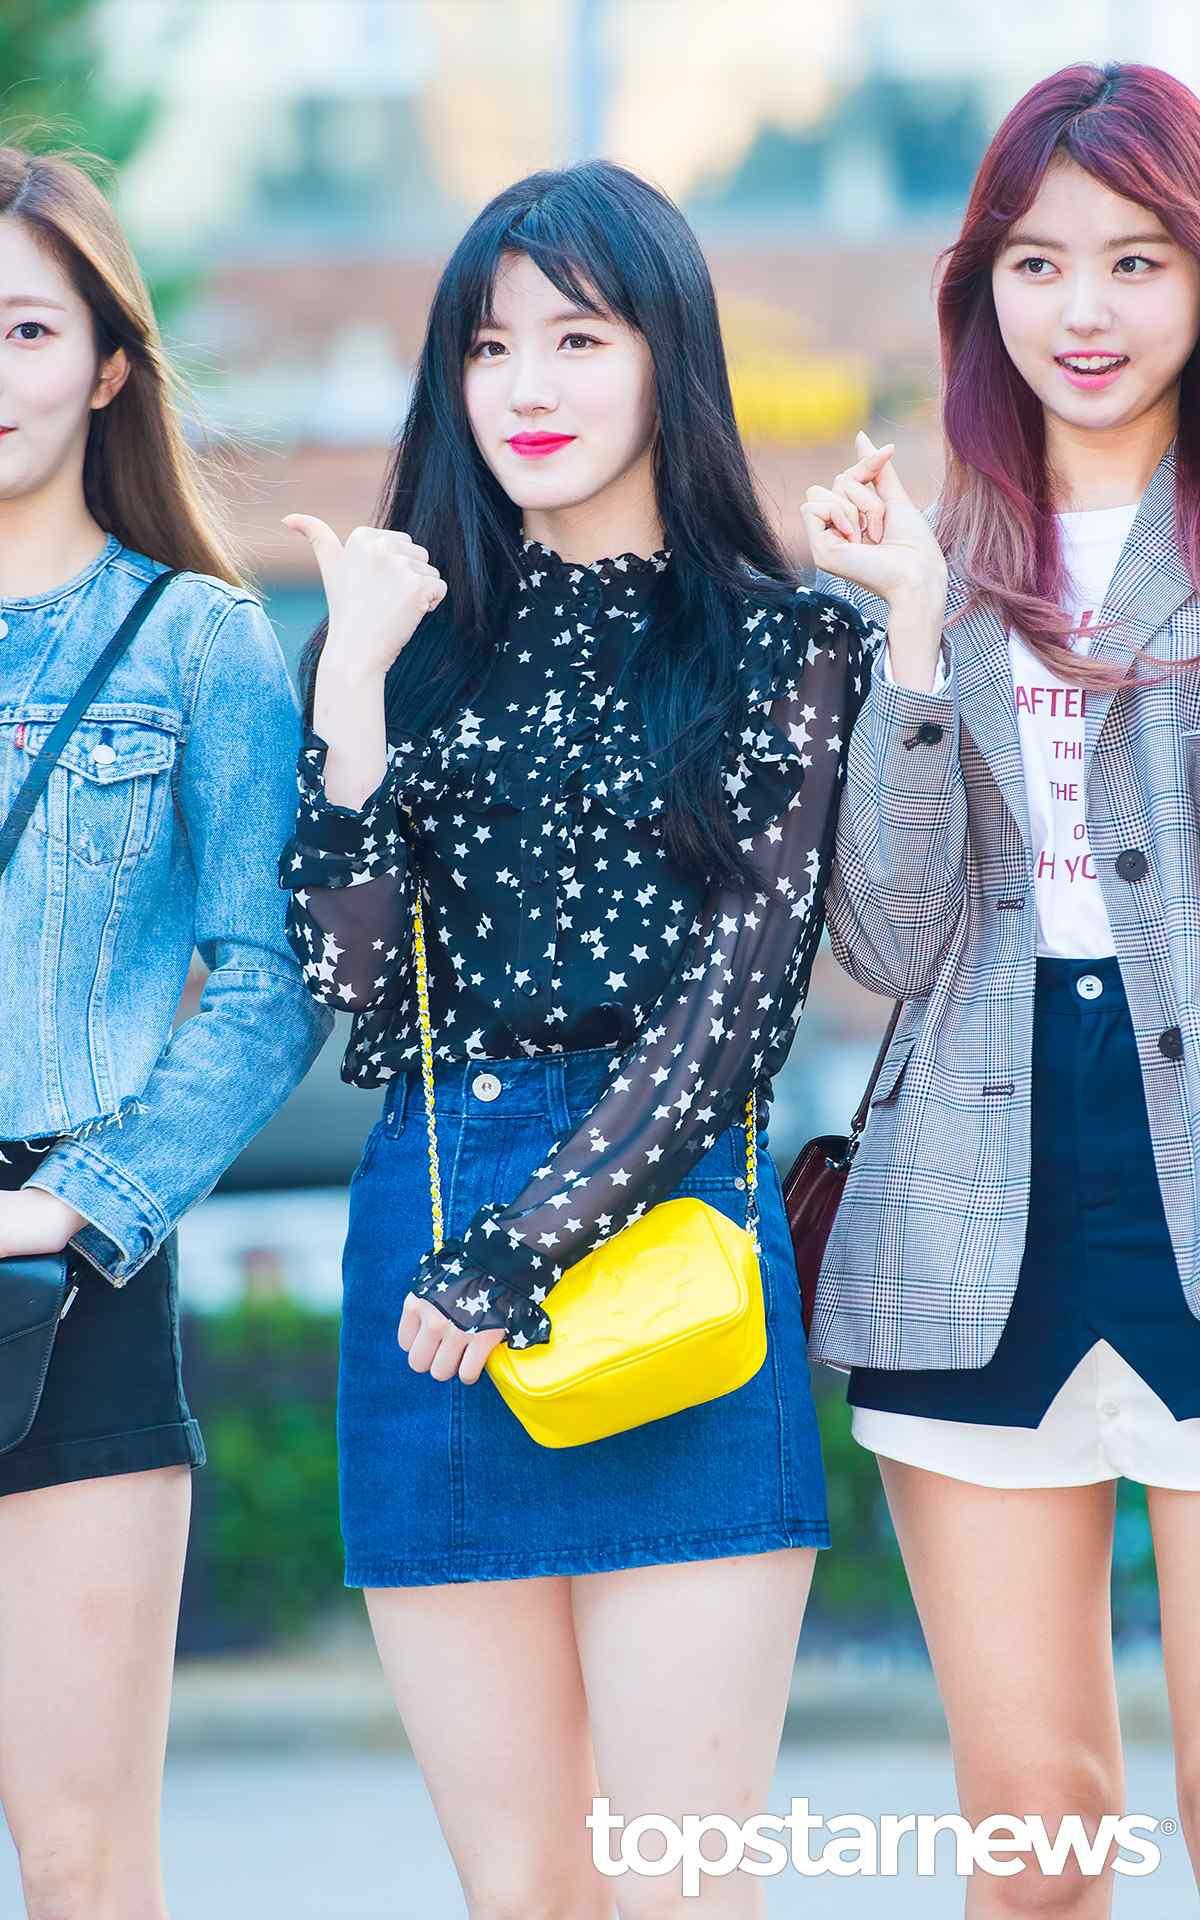 ►PRISTIN-施妍 牛仔短裙絕對不能少啊!除了大勢女團成員之外,其實很多韓國女生在這個季節依然無法拋棄牛仔短裙啊!穿上一件透膚襯衫配上牛仔短裙,女人味十足。尤其將整體的重點放在黃色小包上,讓施妍看起來更迷人了呢!